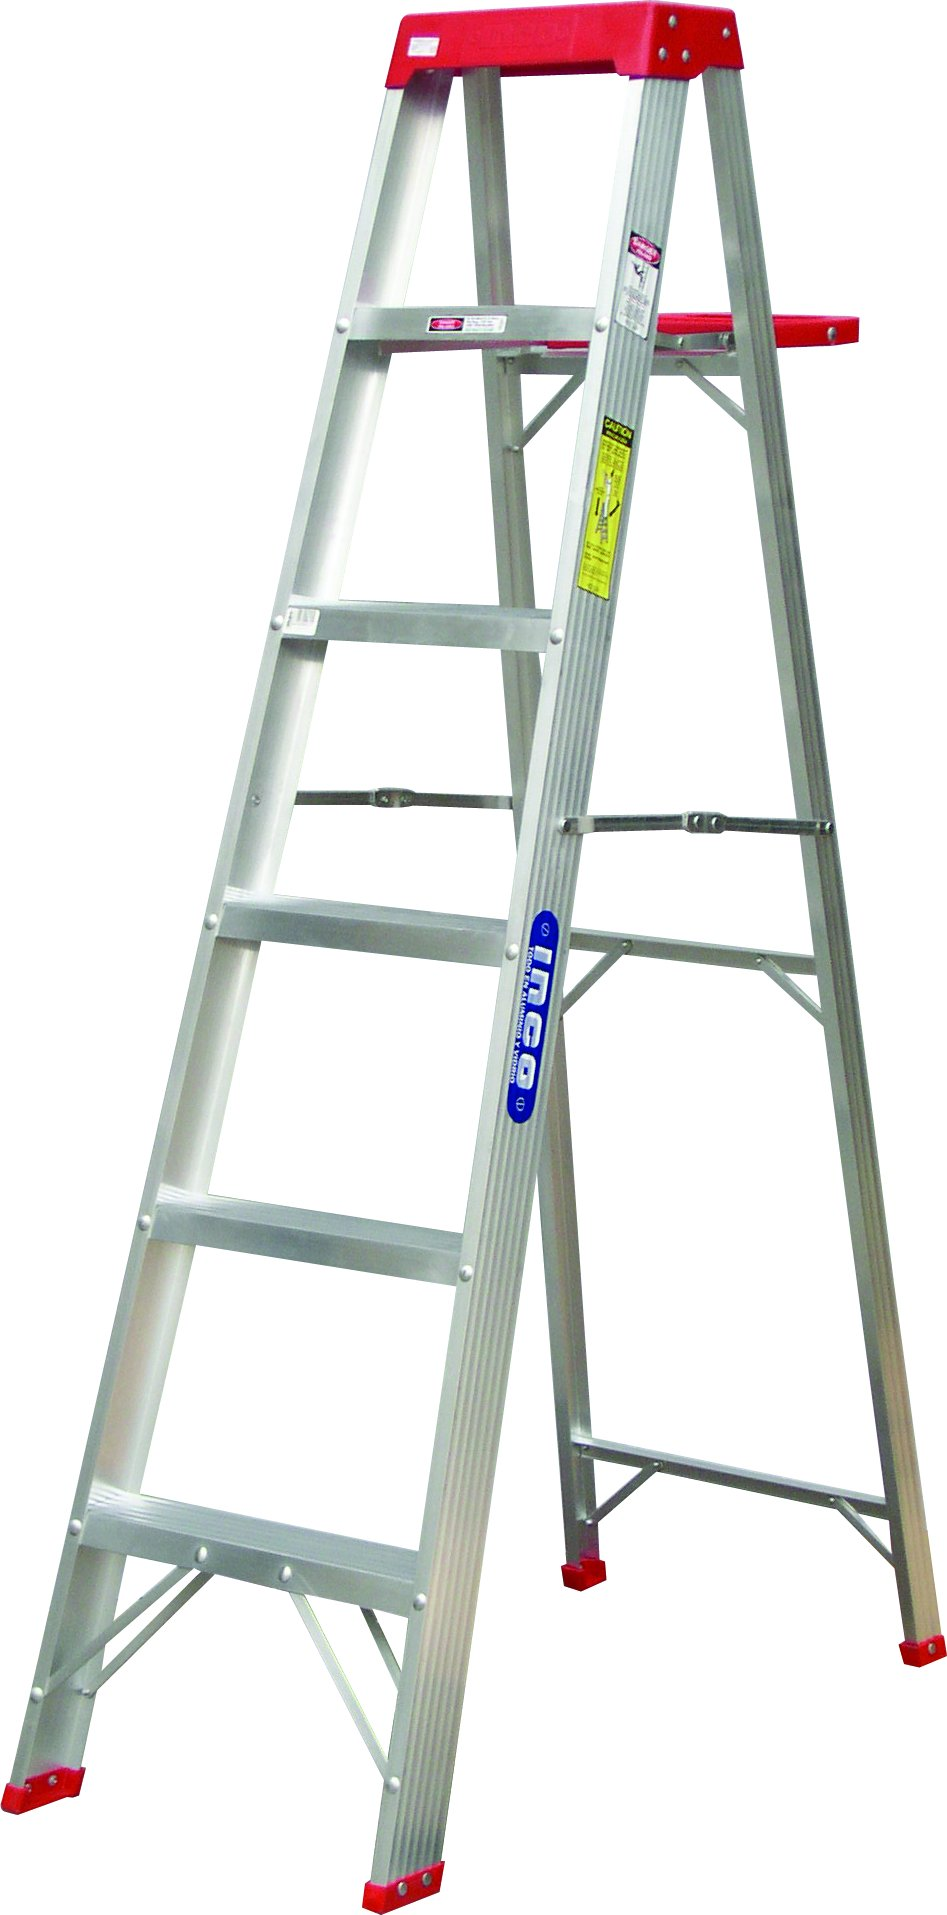 File:Inco Ladder.jpg - Wikimedia Commons